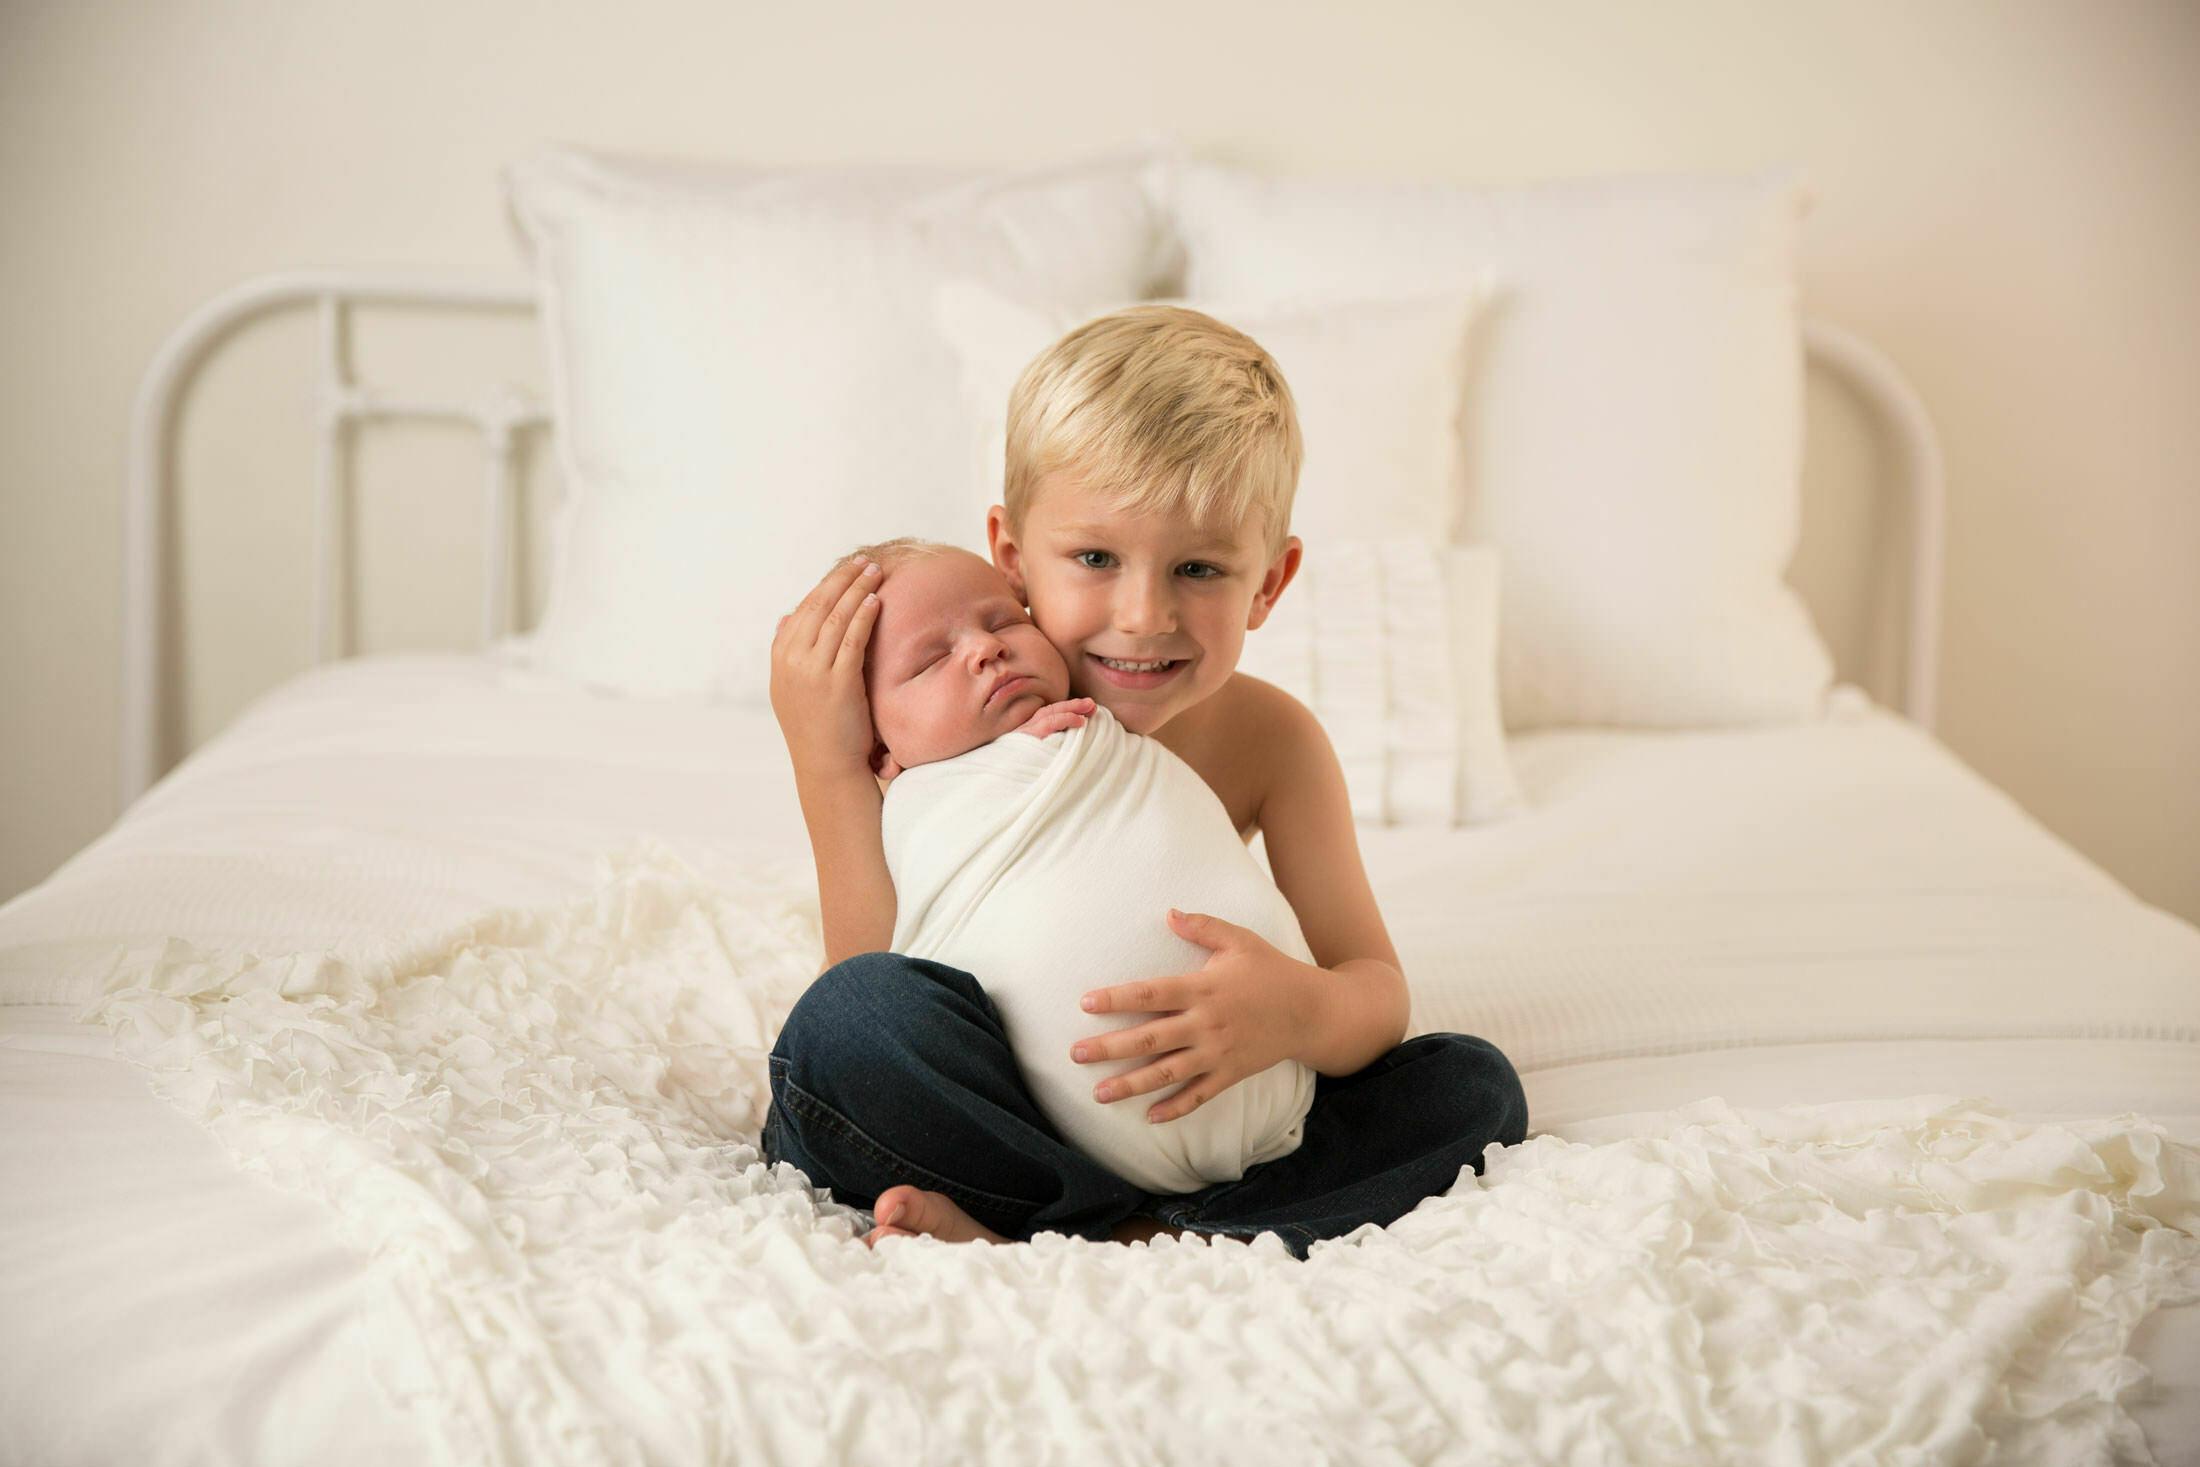 los angeles newborn sibling photo photographer 1